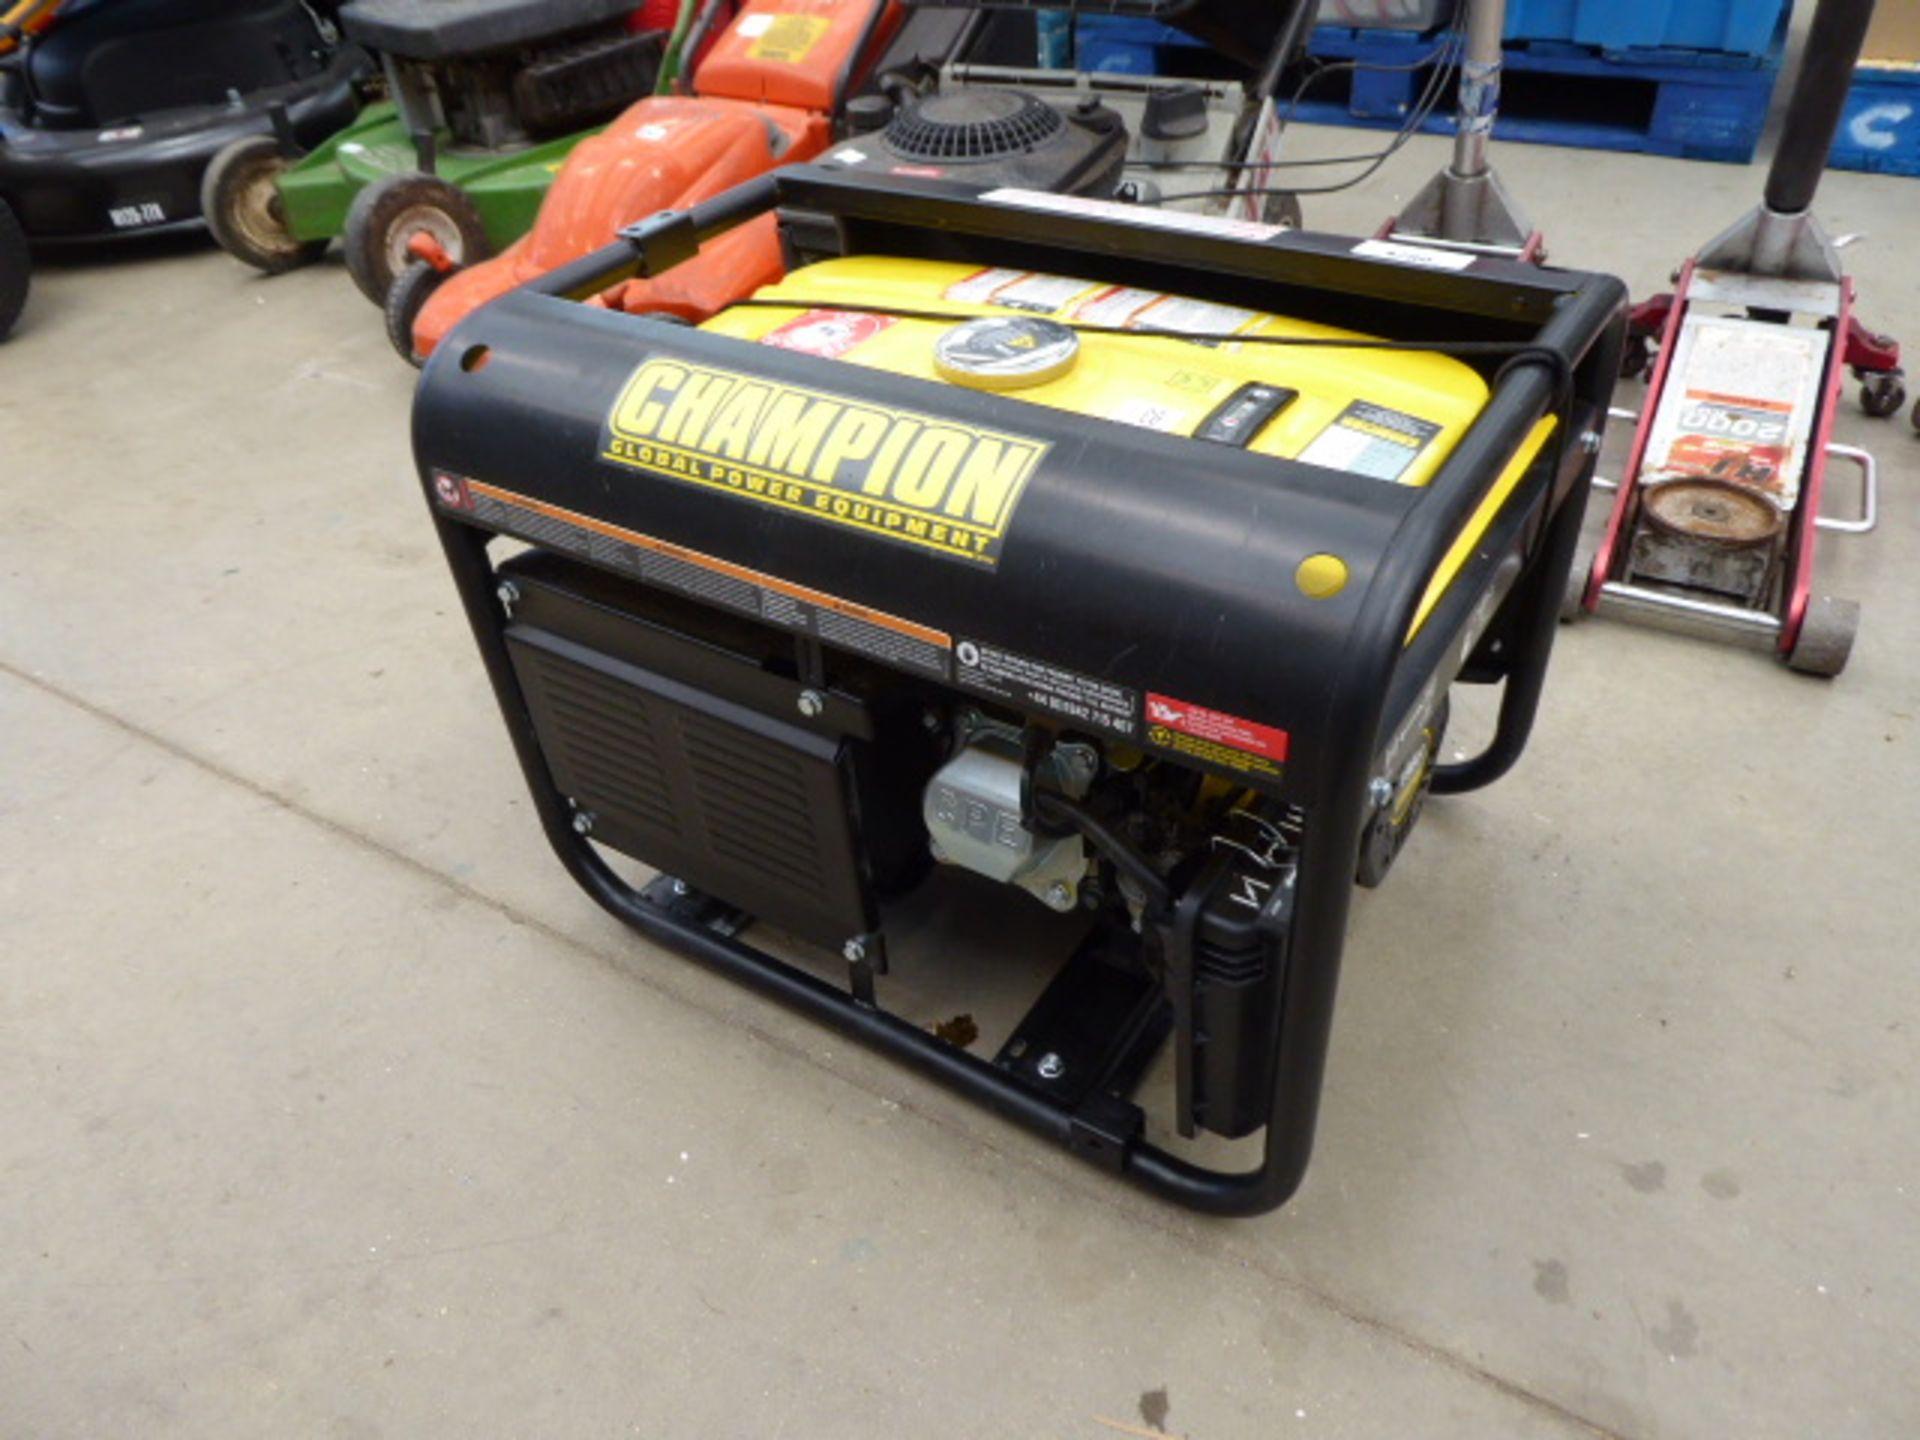 Lot 4280 - Champion petrol powered generator